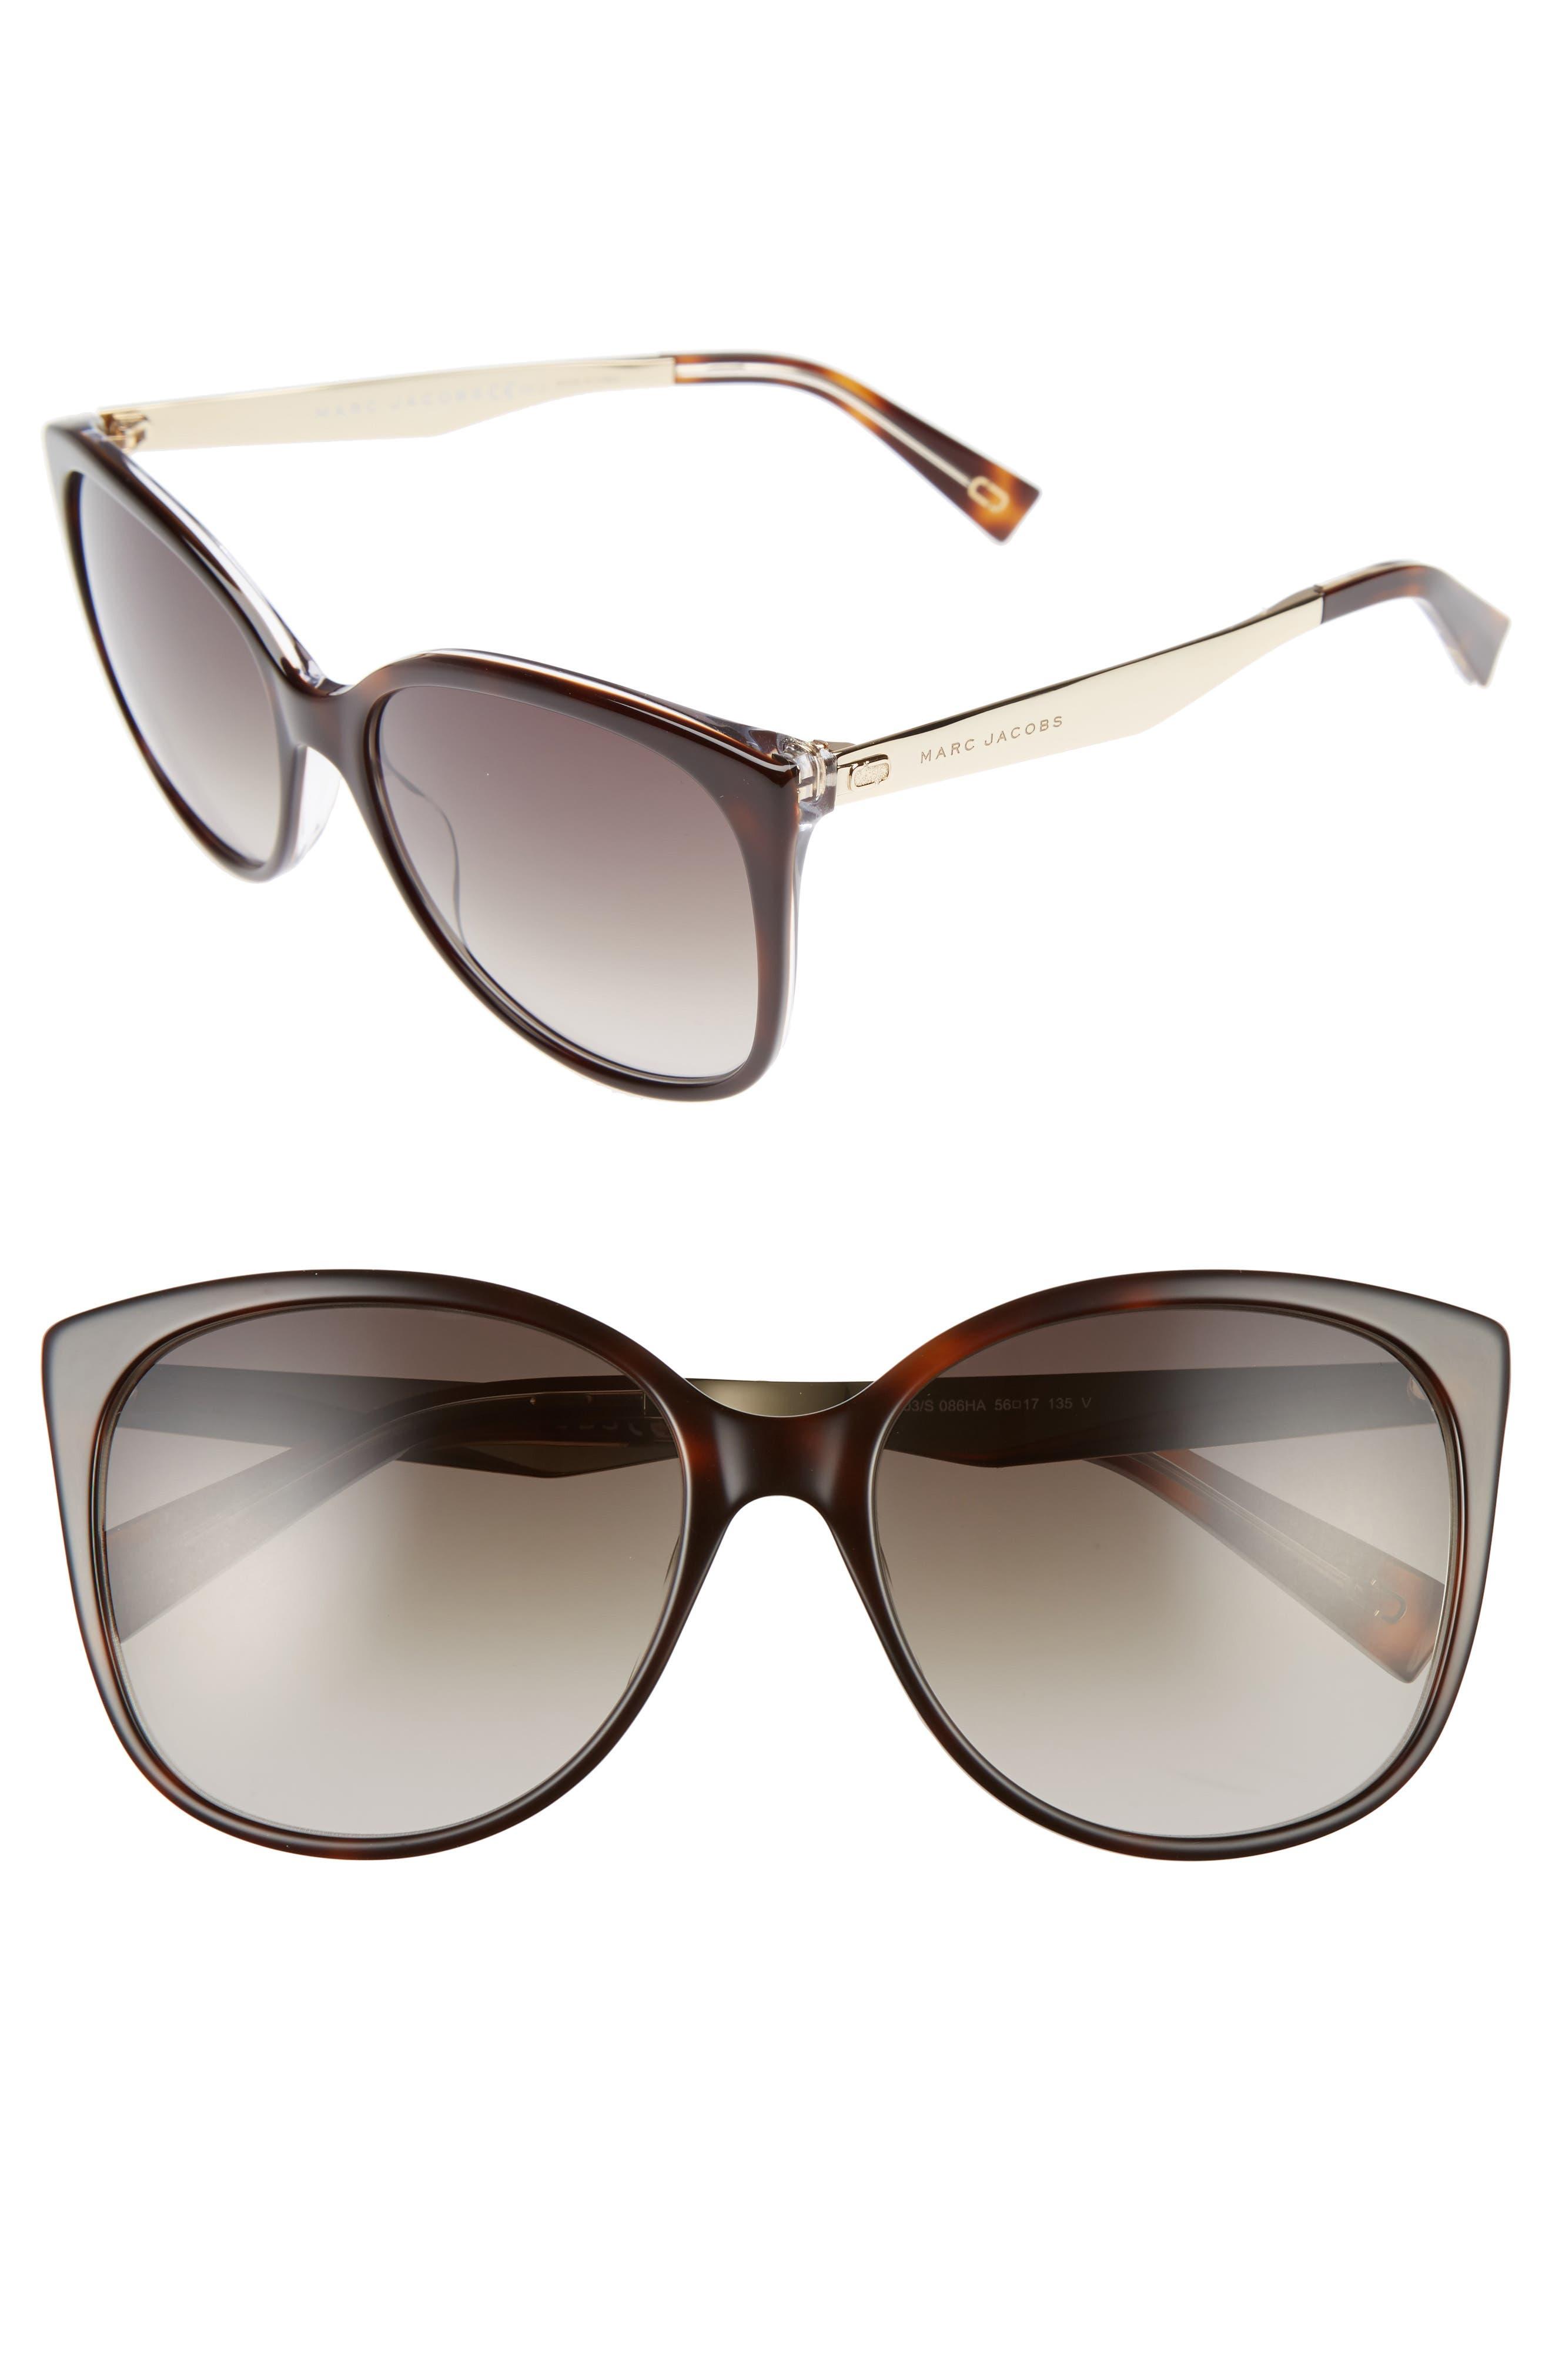 MARC JACOBS, 56mm Gradient Lens Butterfly Sunglasses, Main thumbnail 1, color, DARK HAVANA